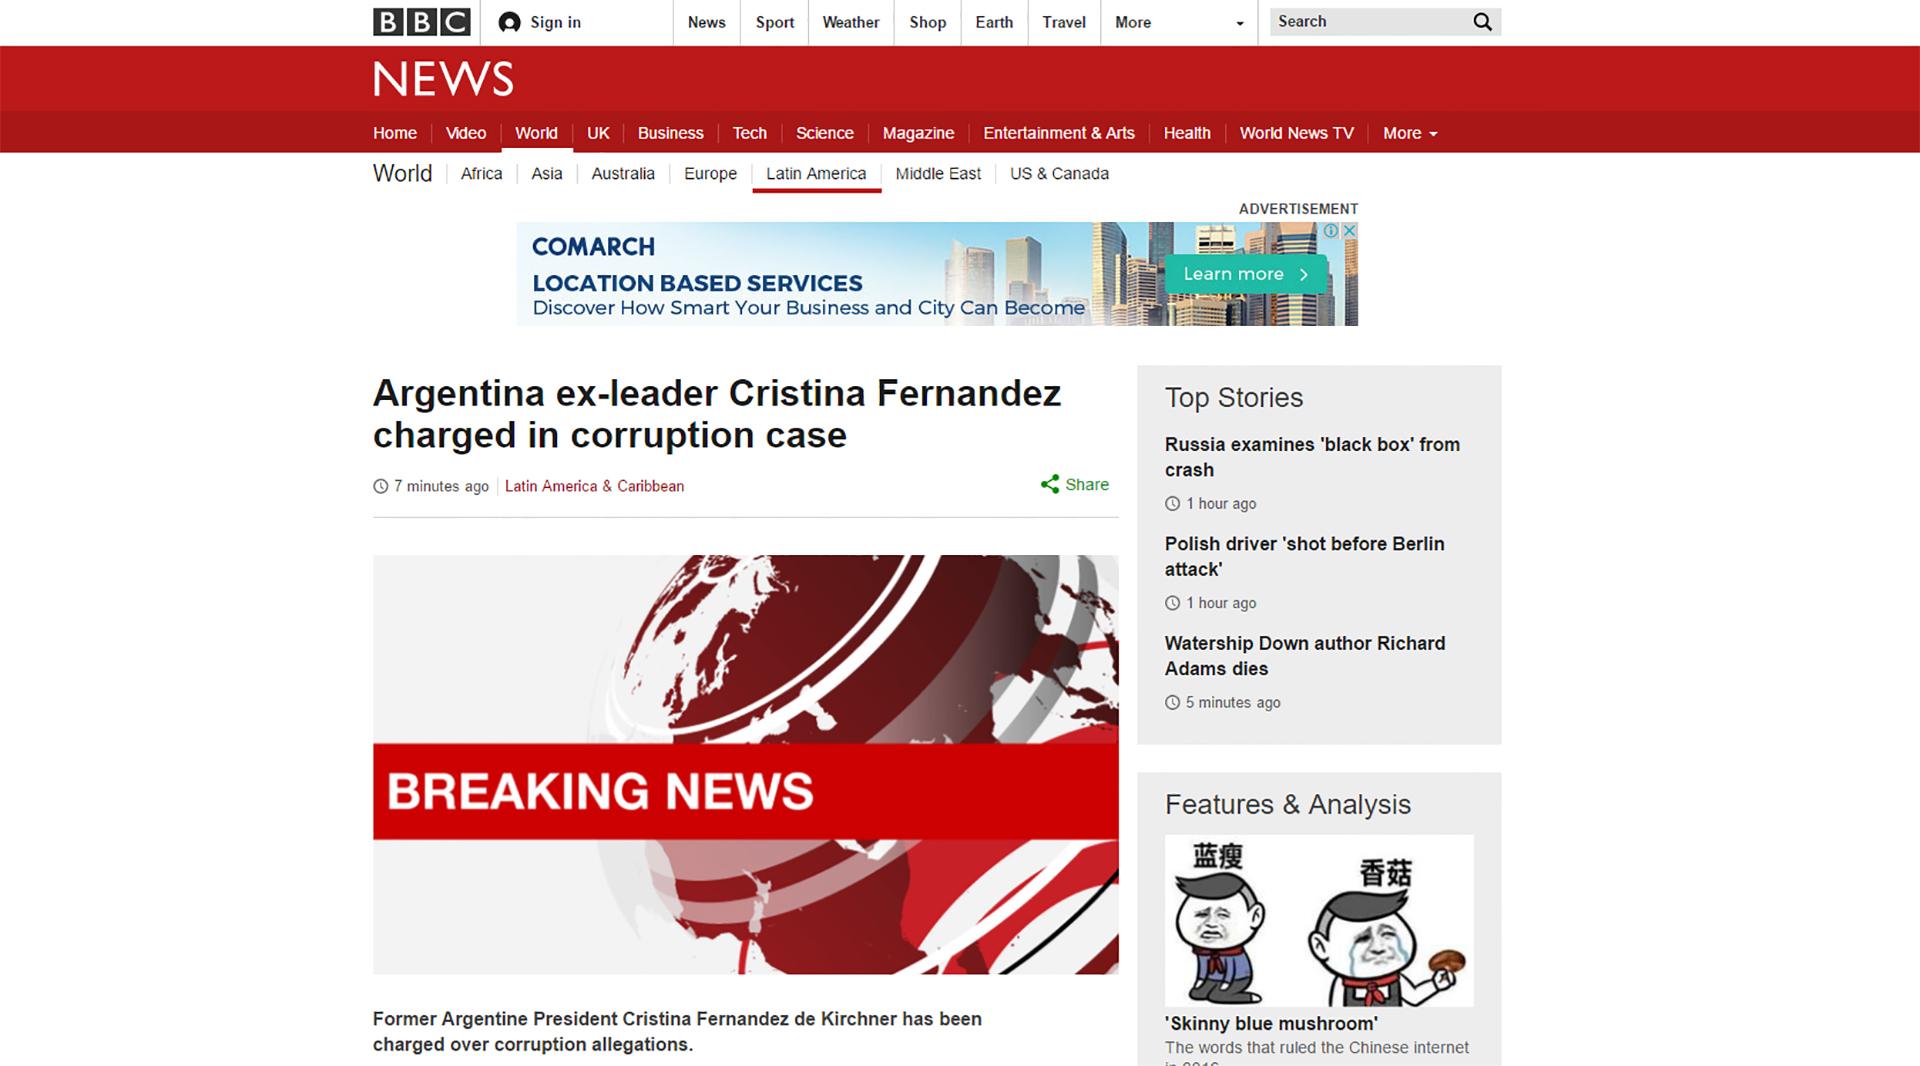 La BBC emitió un alerta por la situación procesal de Cristina Elisabet Kirchner